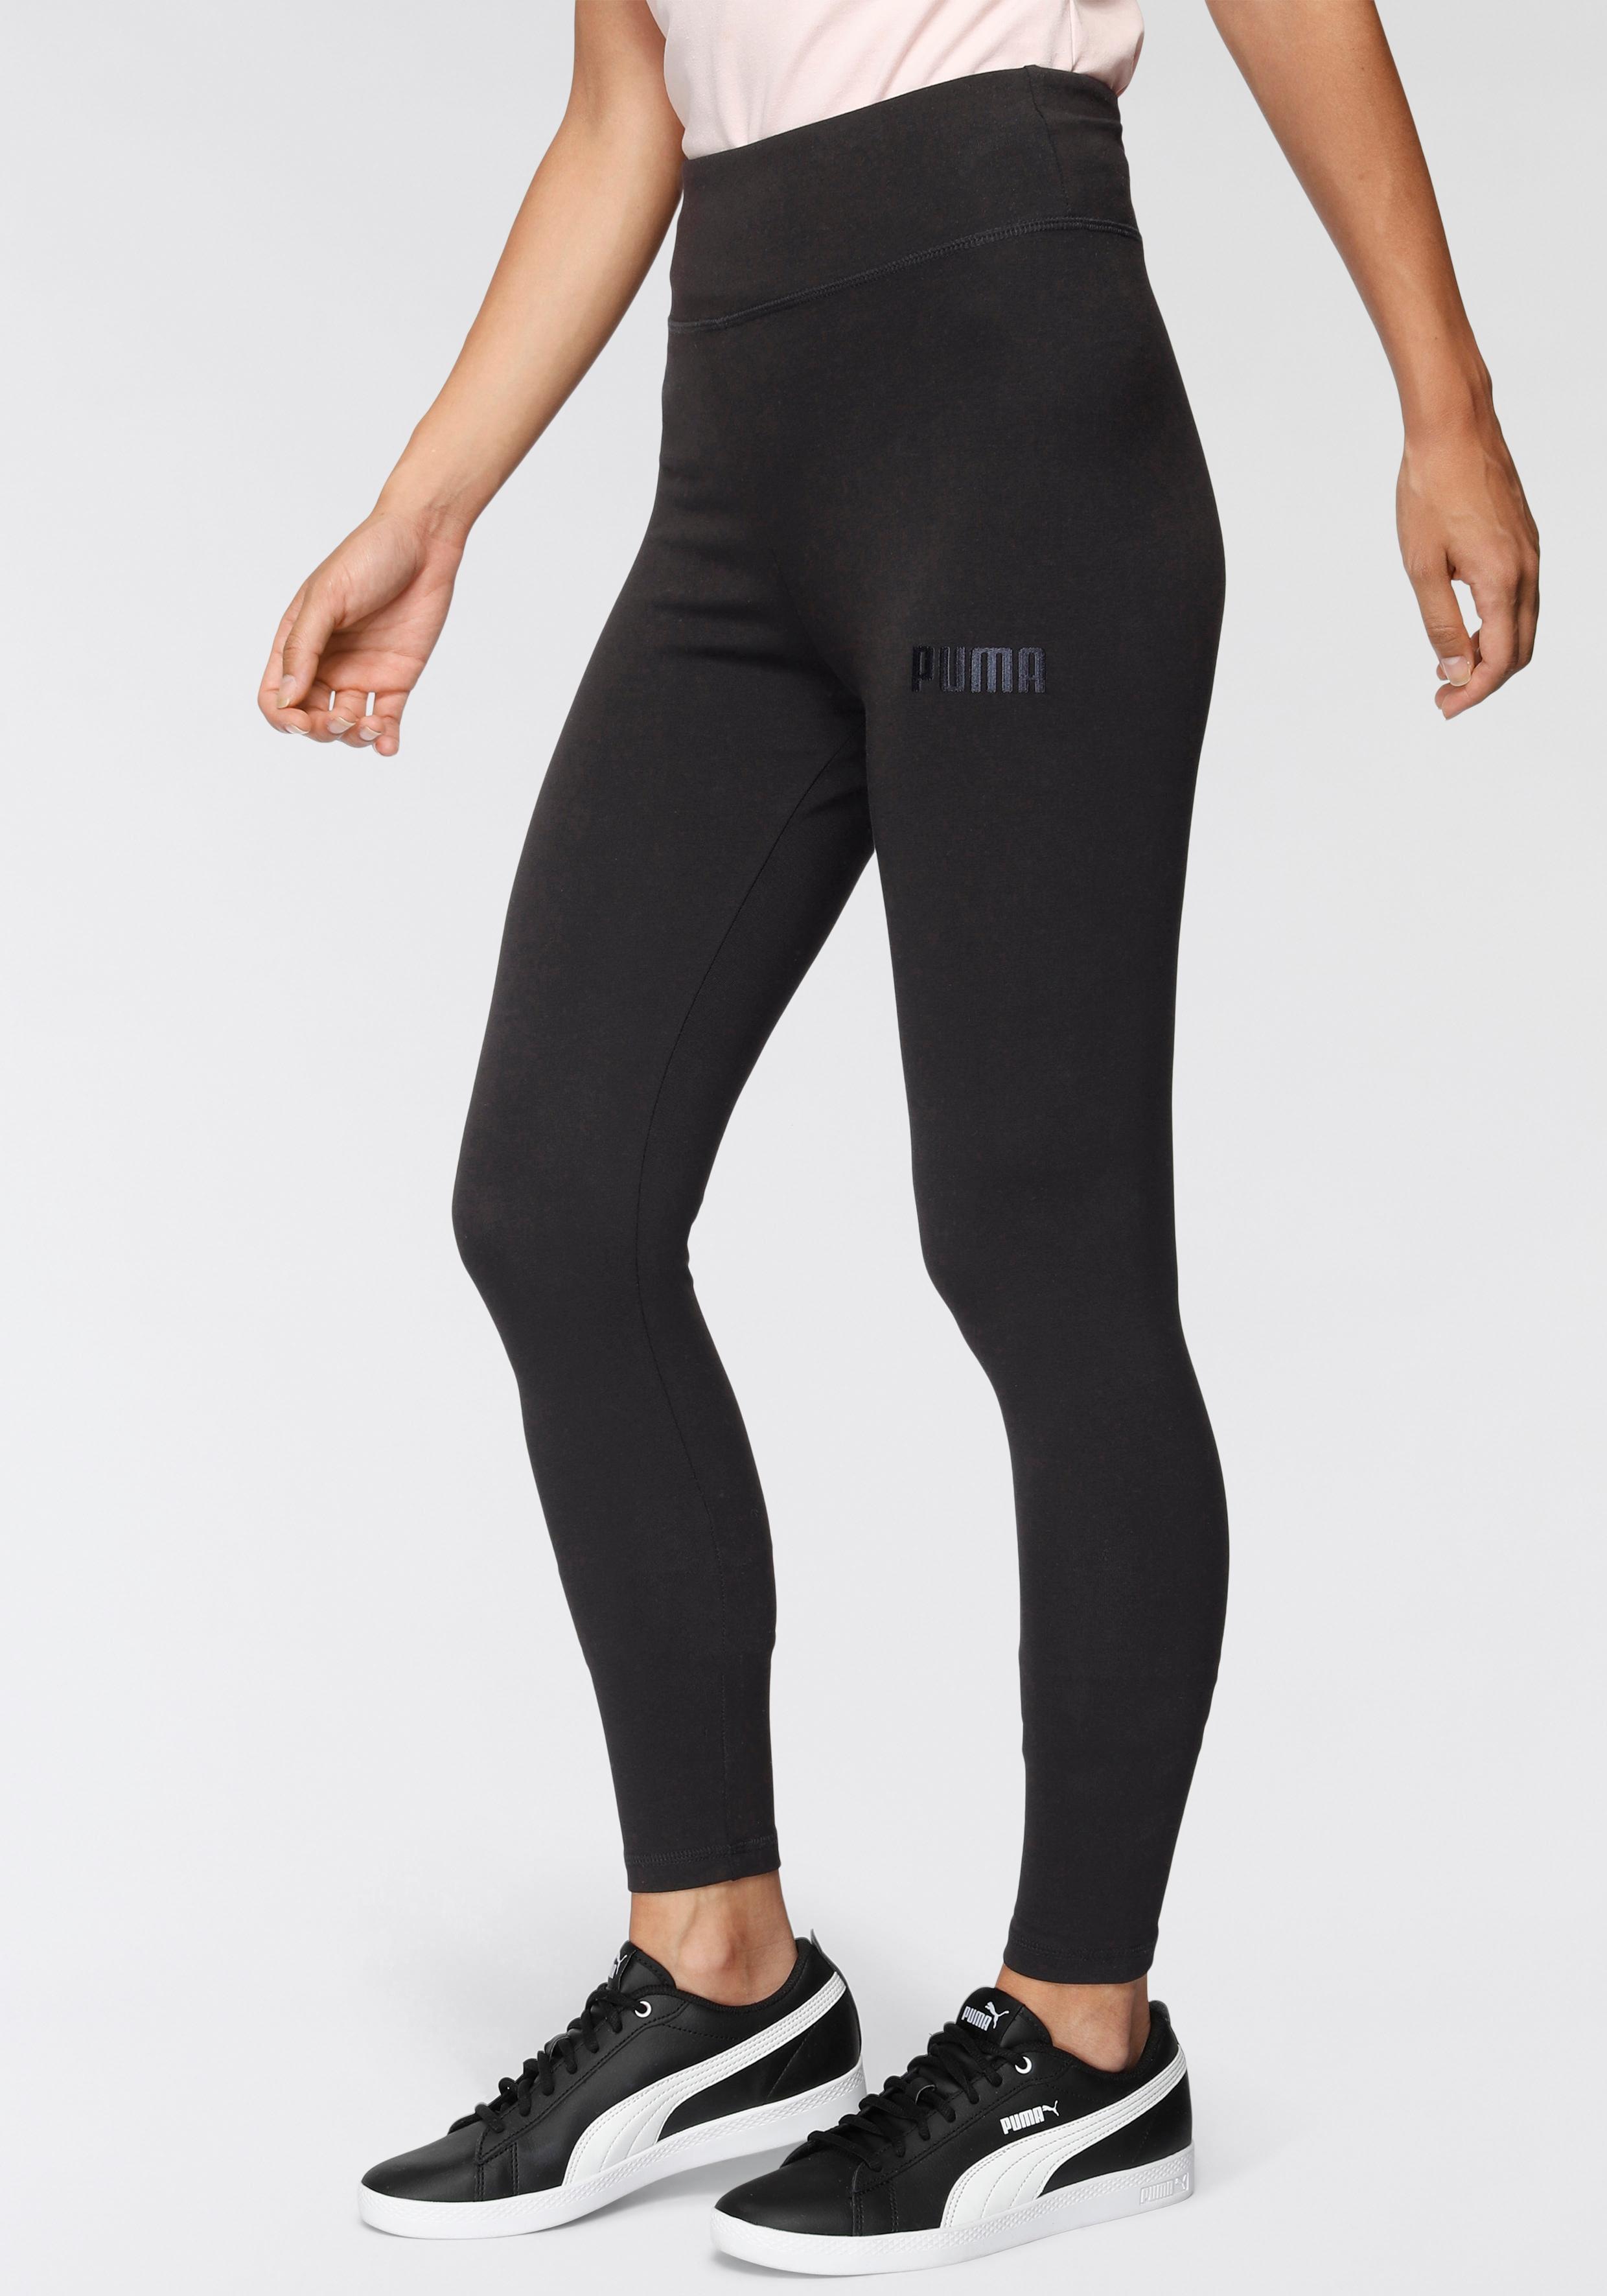 puma -  Leggings Her High Waist Leggings